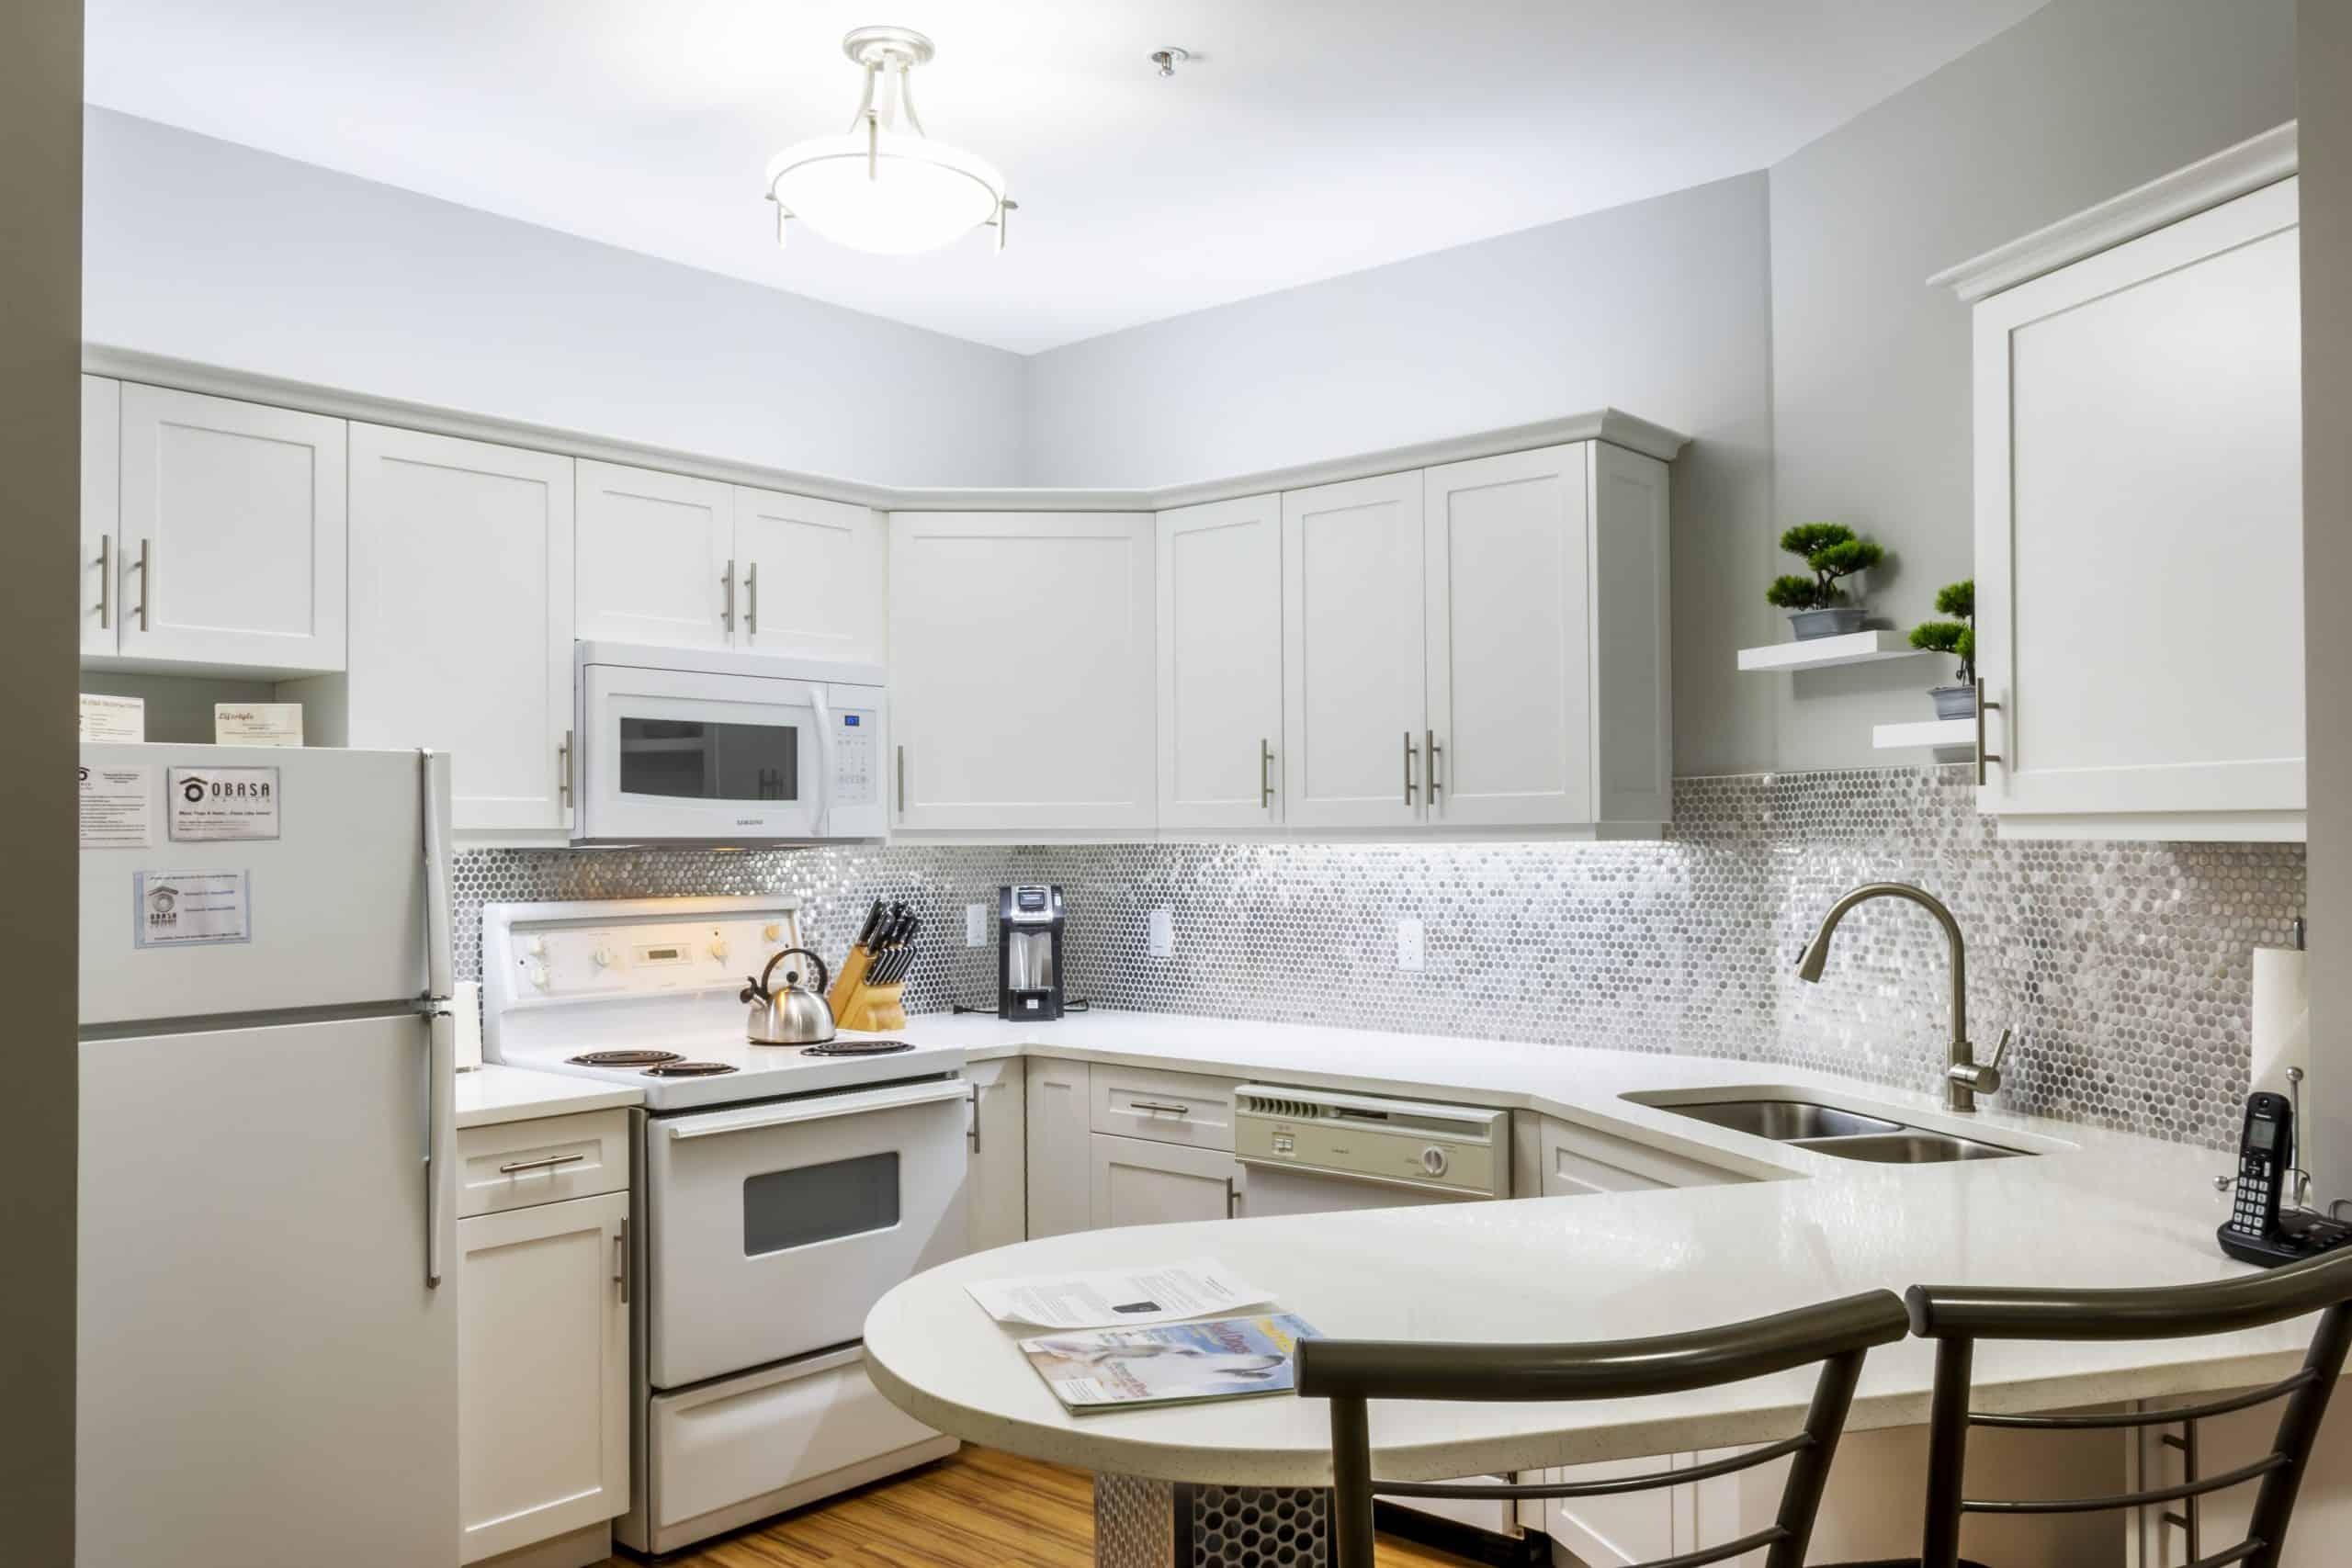 Hamilton-508-2br-Kitchen